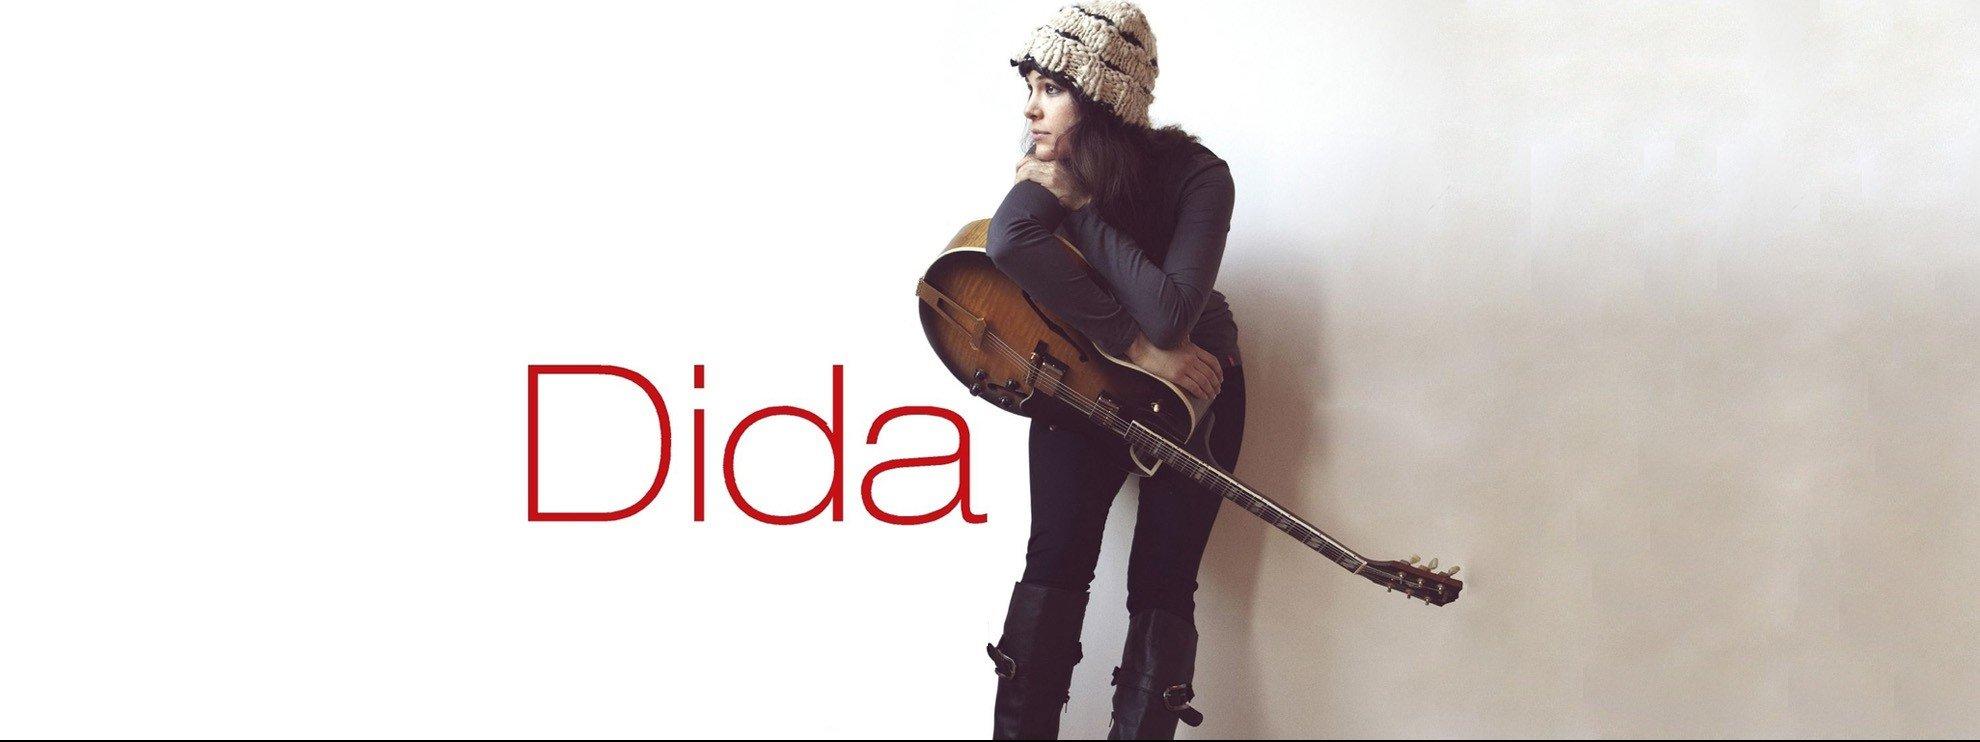 performer Dida Pelled